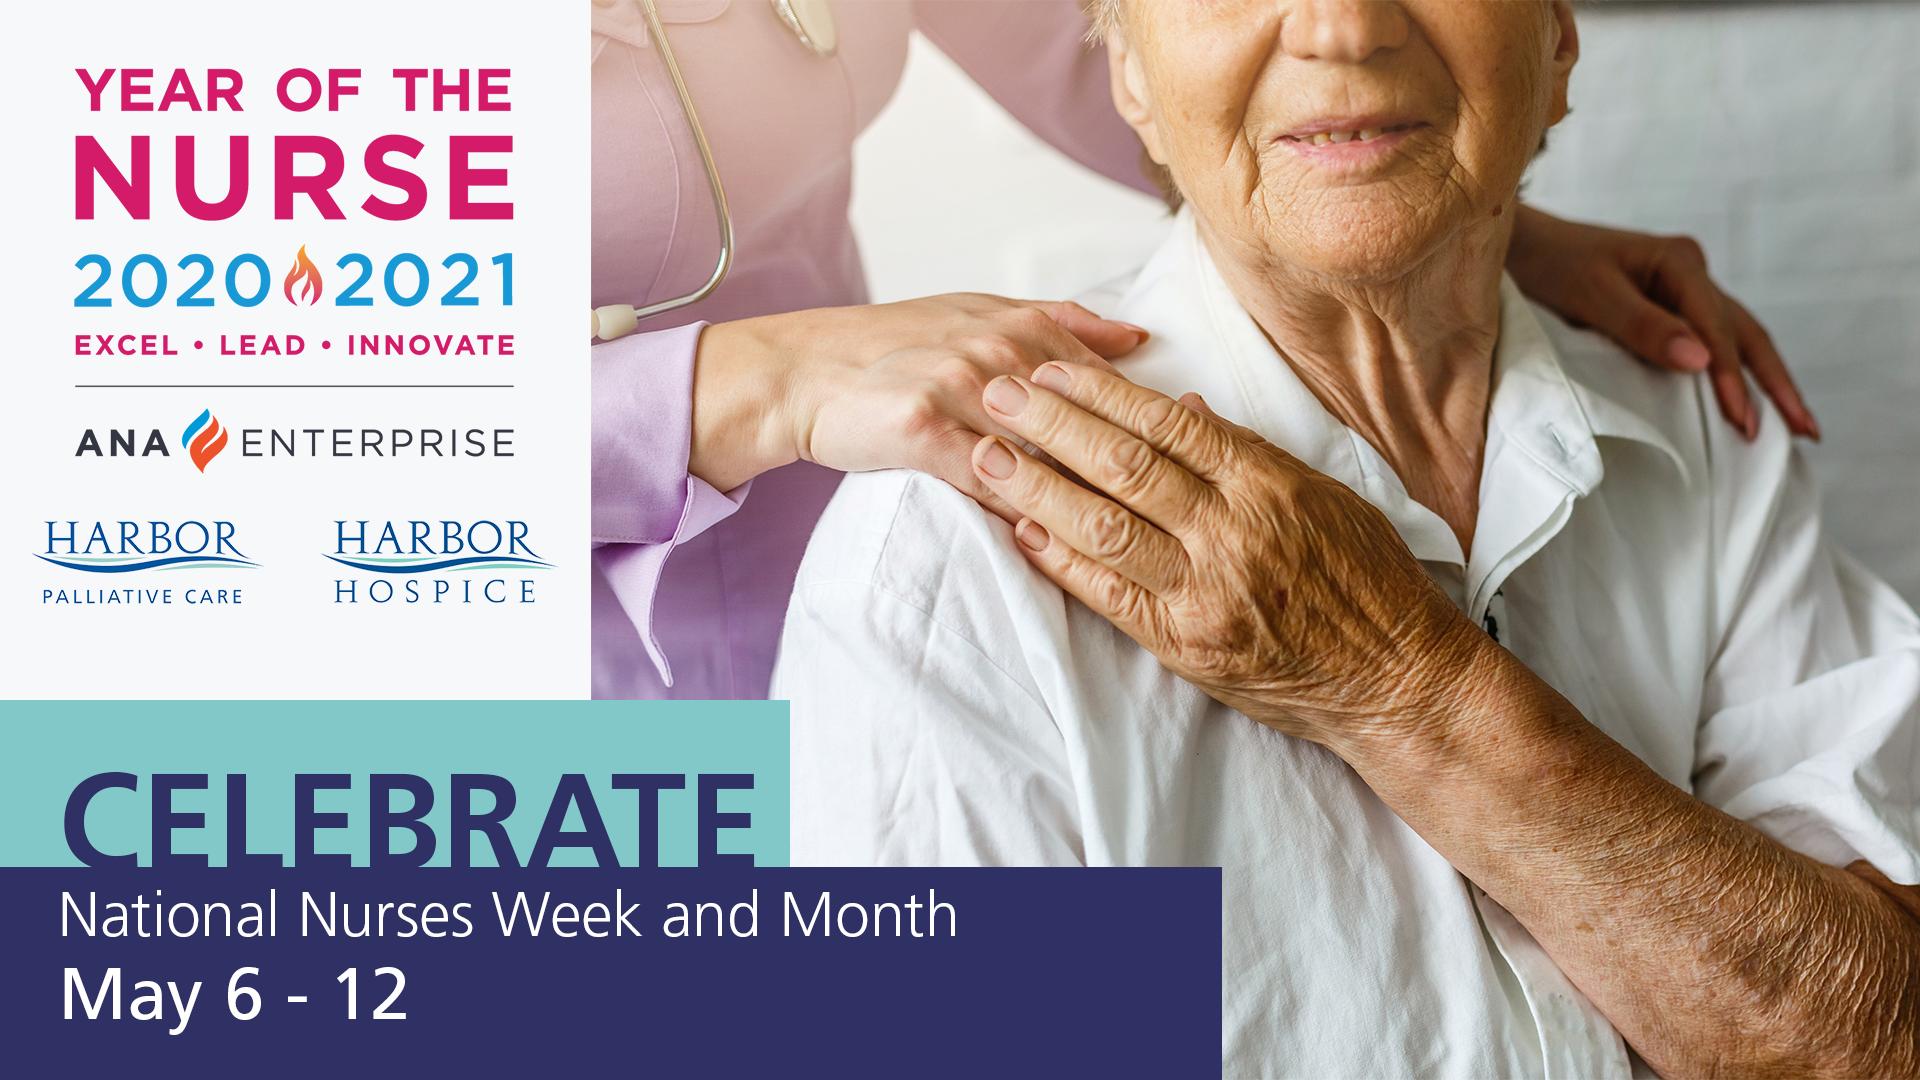 Announcement National Week Month nurses - We Love Our Nurses. It's National Nurse Week and Month.